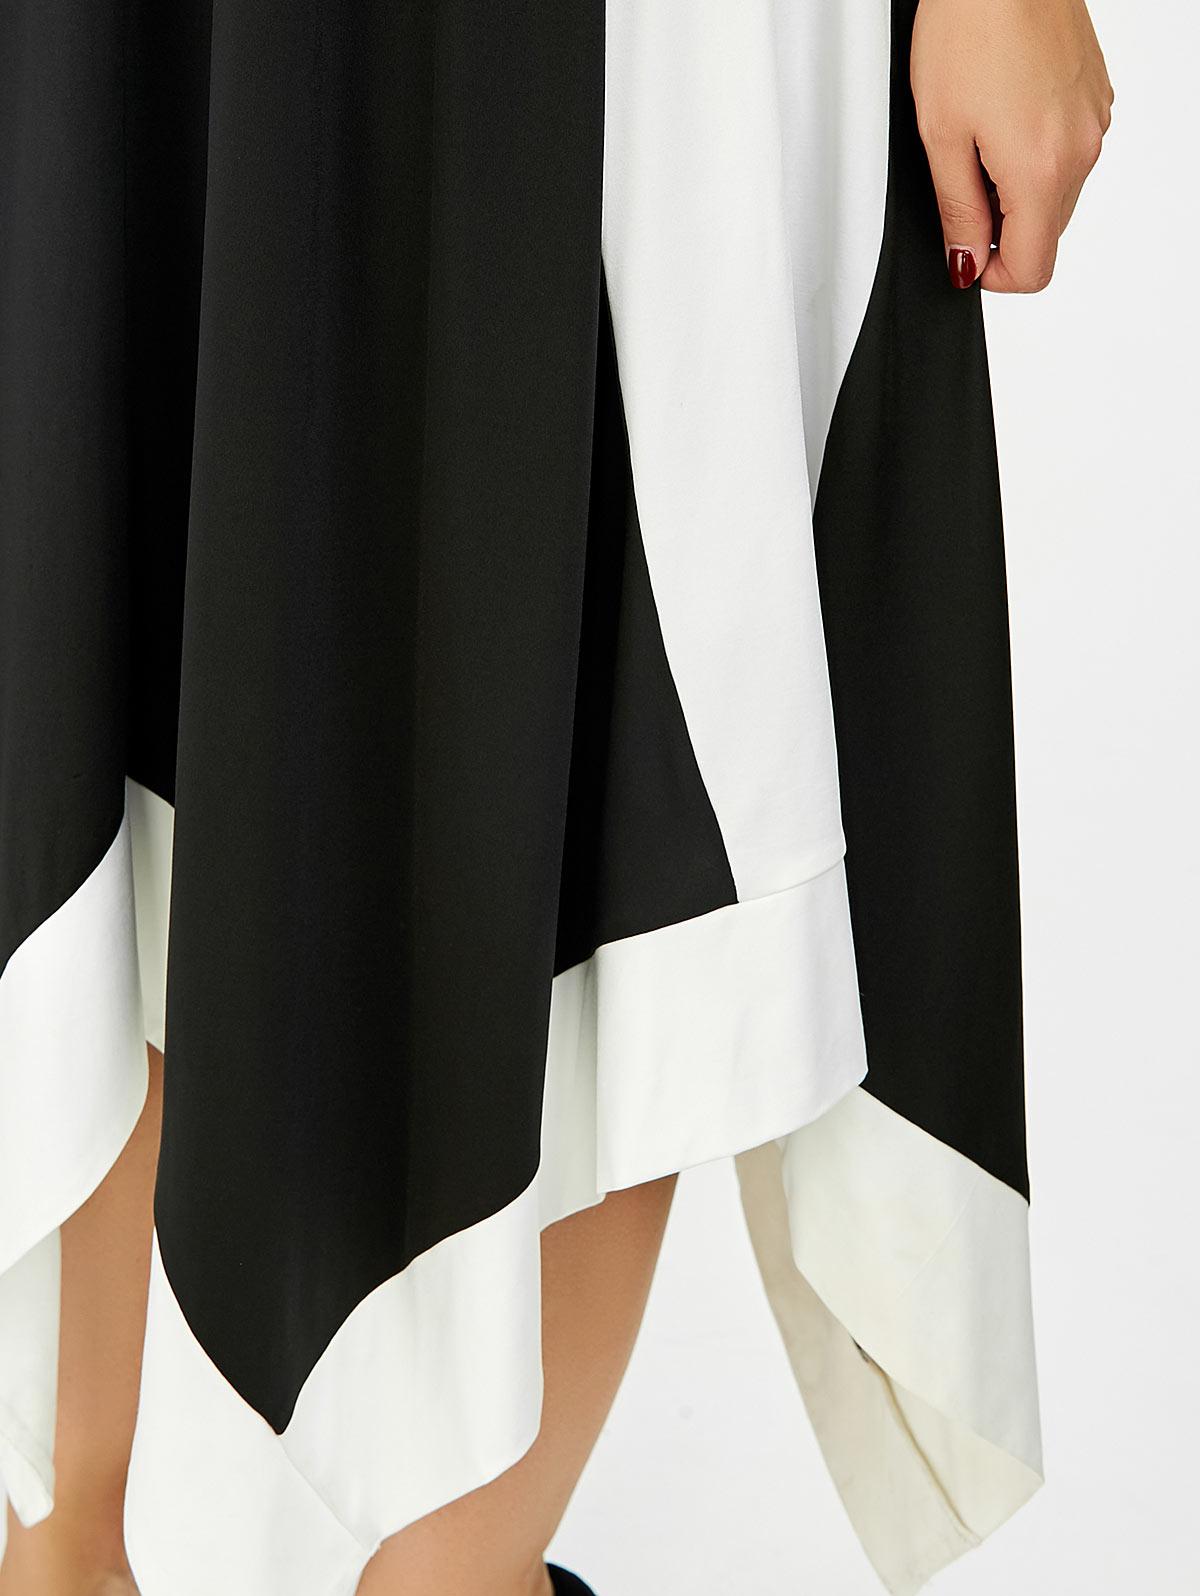 fe429f3ebe8db US $25.44 |Gamiss Women Summer Plus Size Solid Swing Dress Two Tone  Handkerchief Slip Dress Casual Sleeveless Beach Dress Vestido Femme-in  Dresses ...